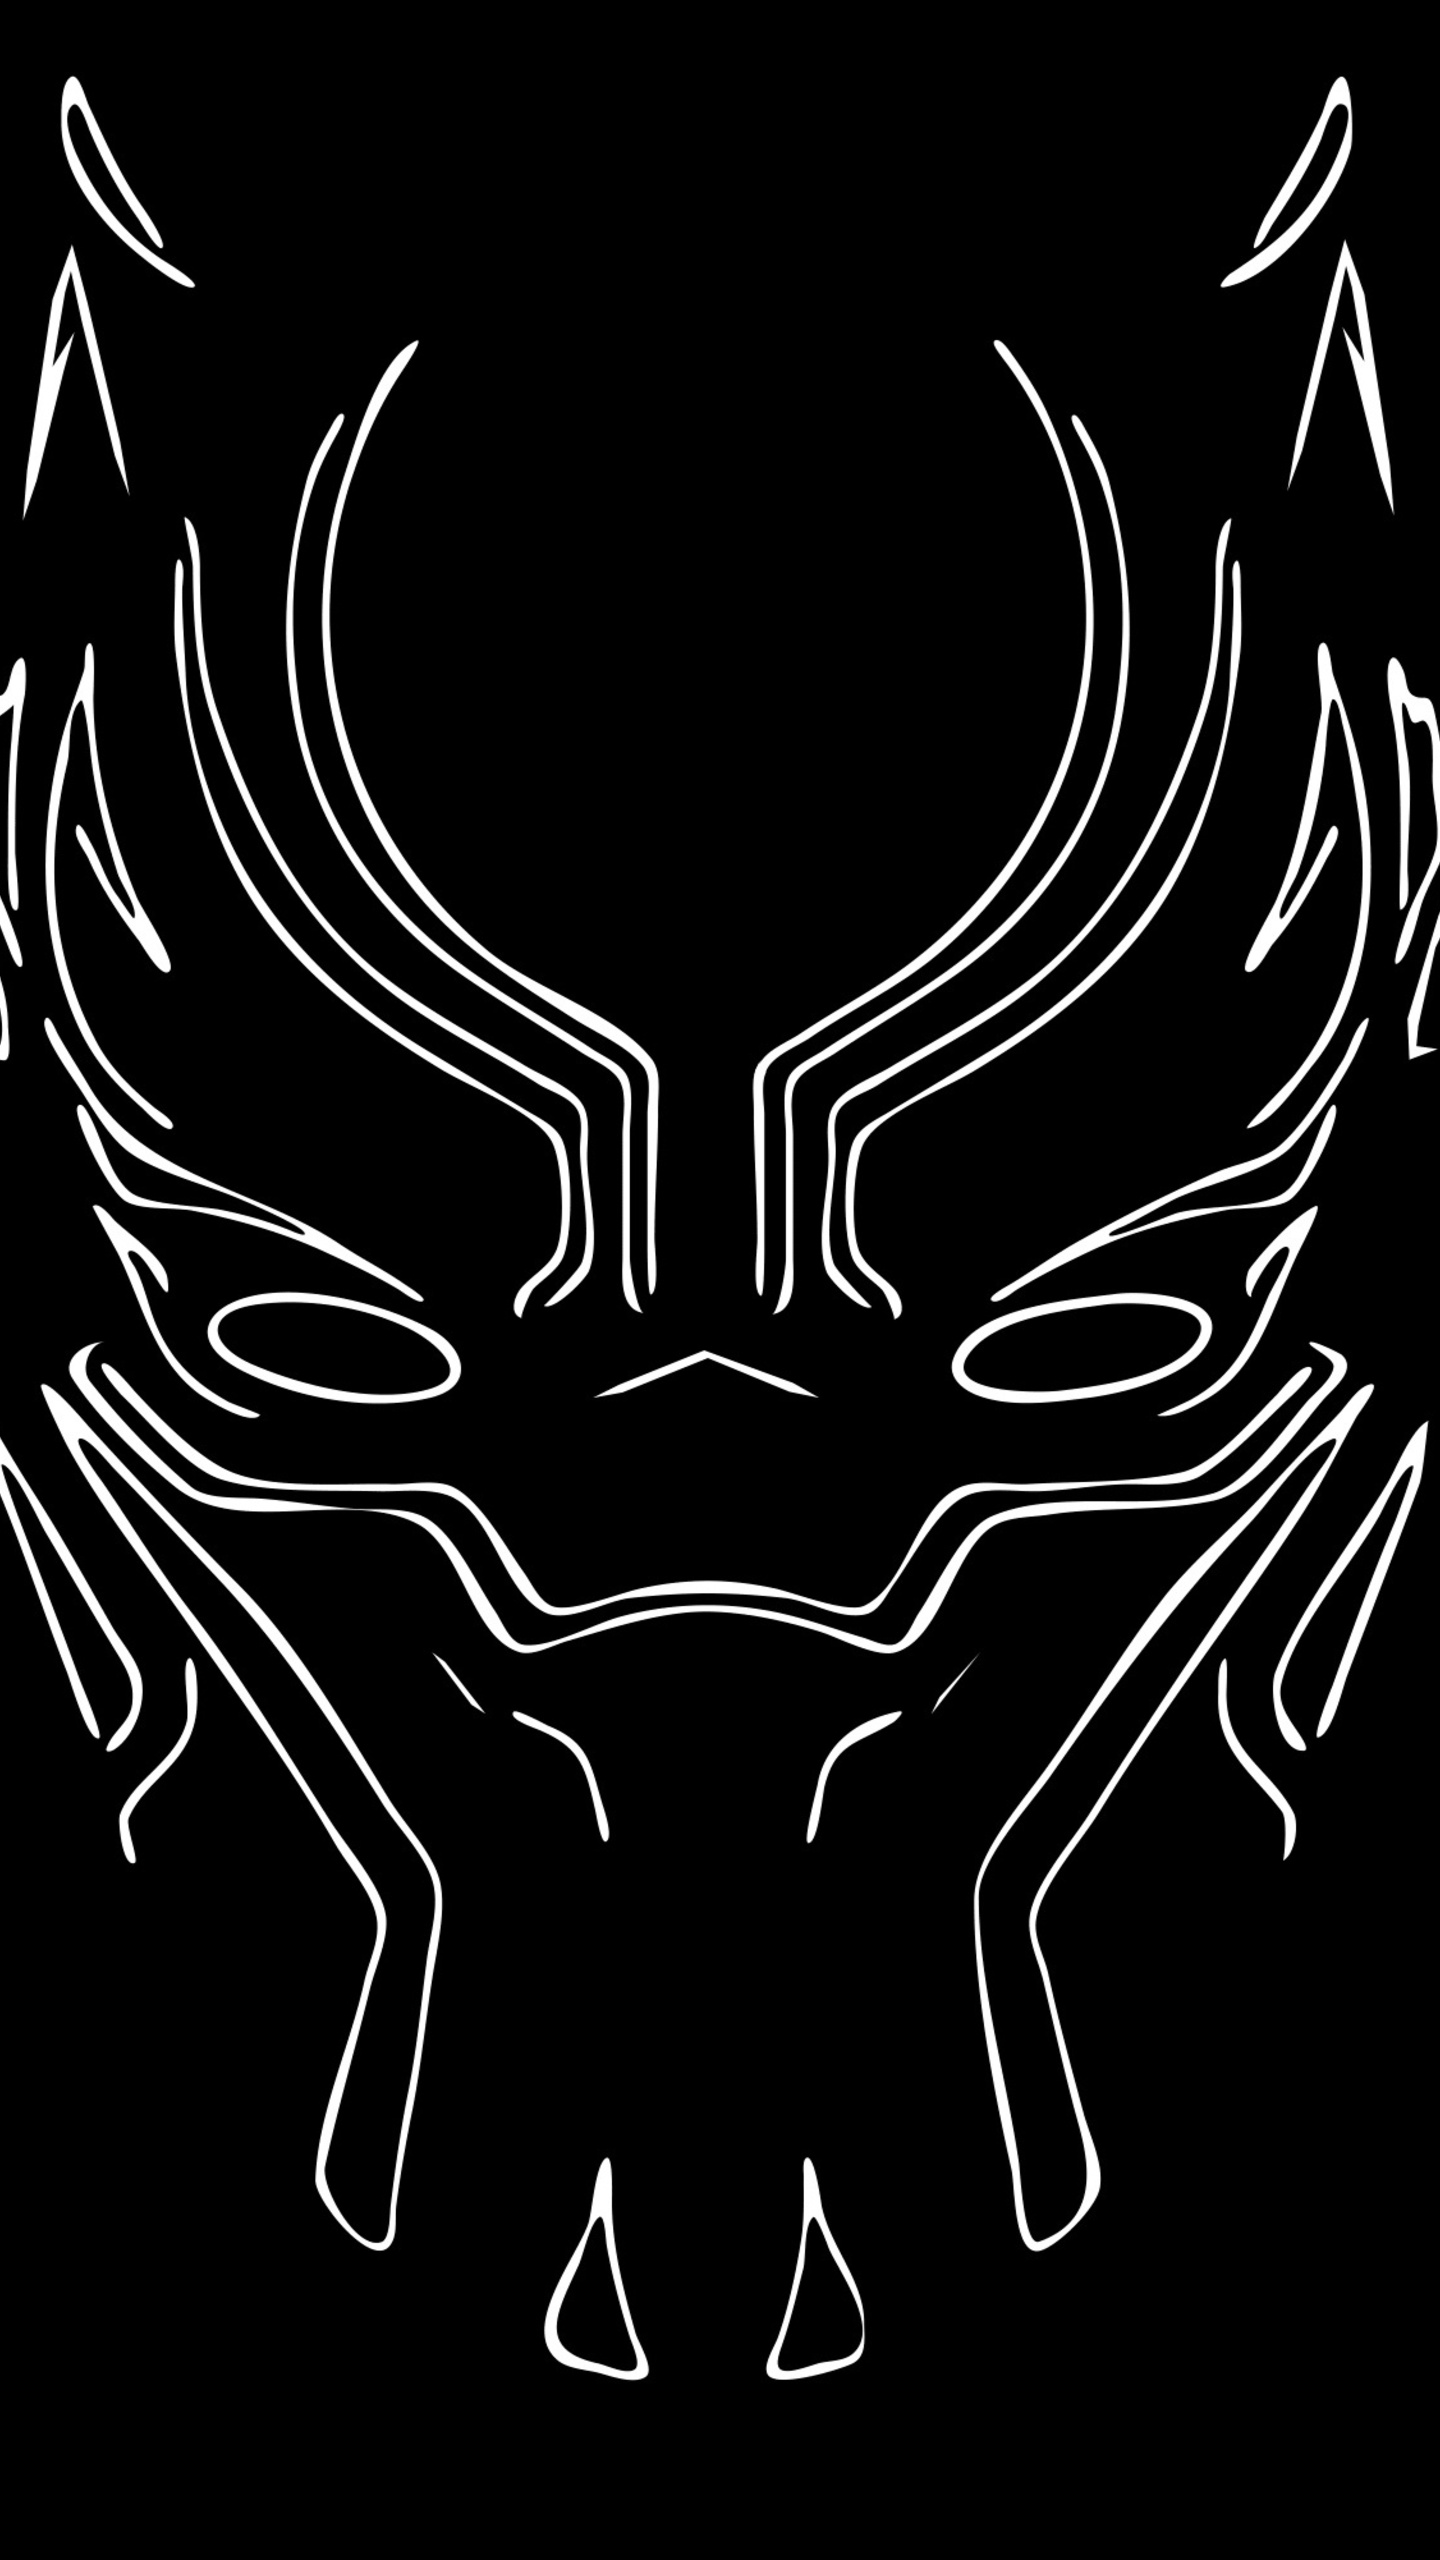 1440x2560 Black Panther 4k Artwork Samsung Galaxy S6 S7 Google